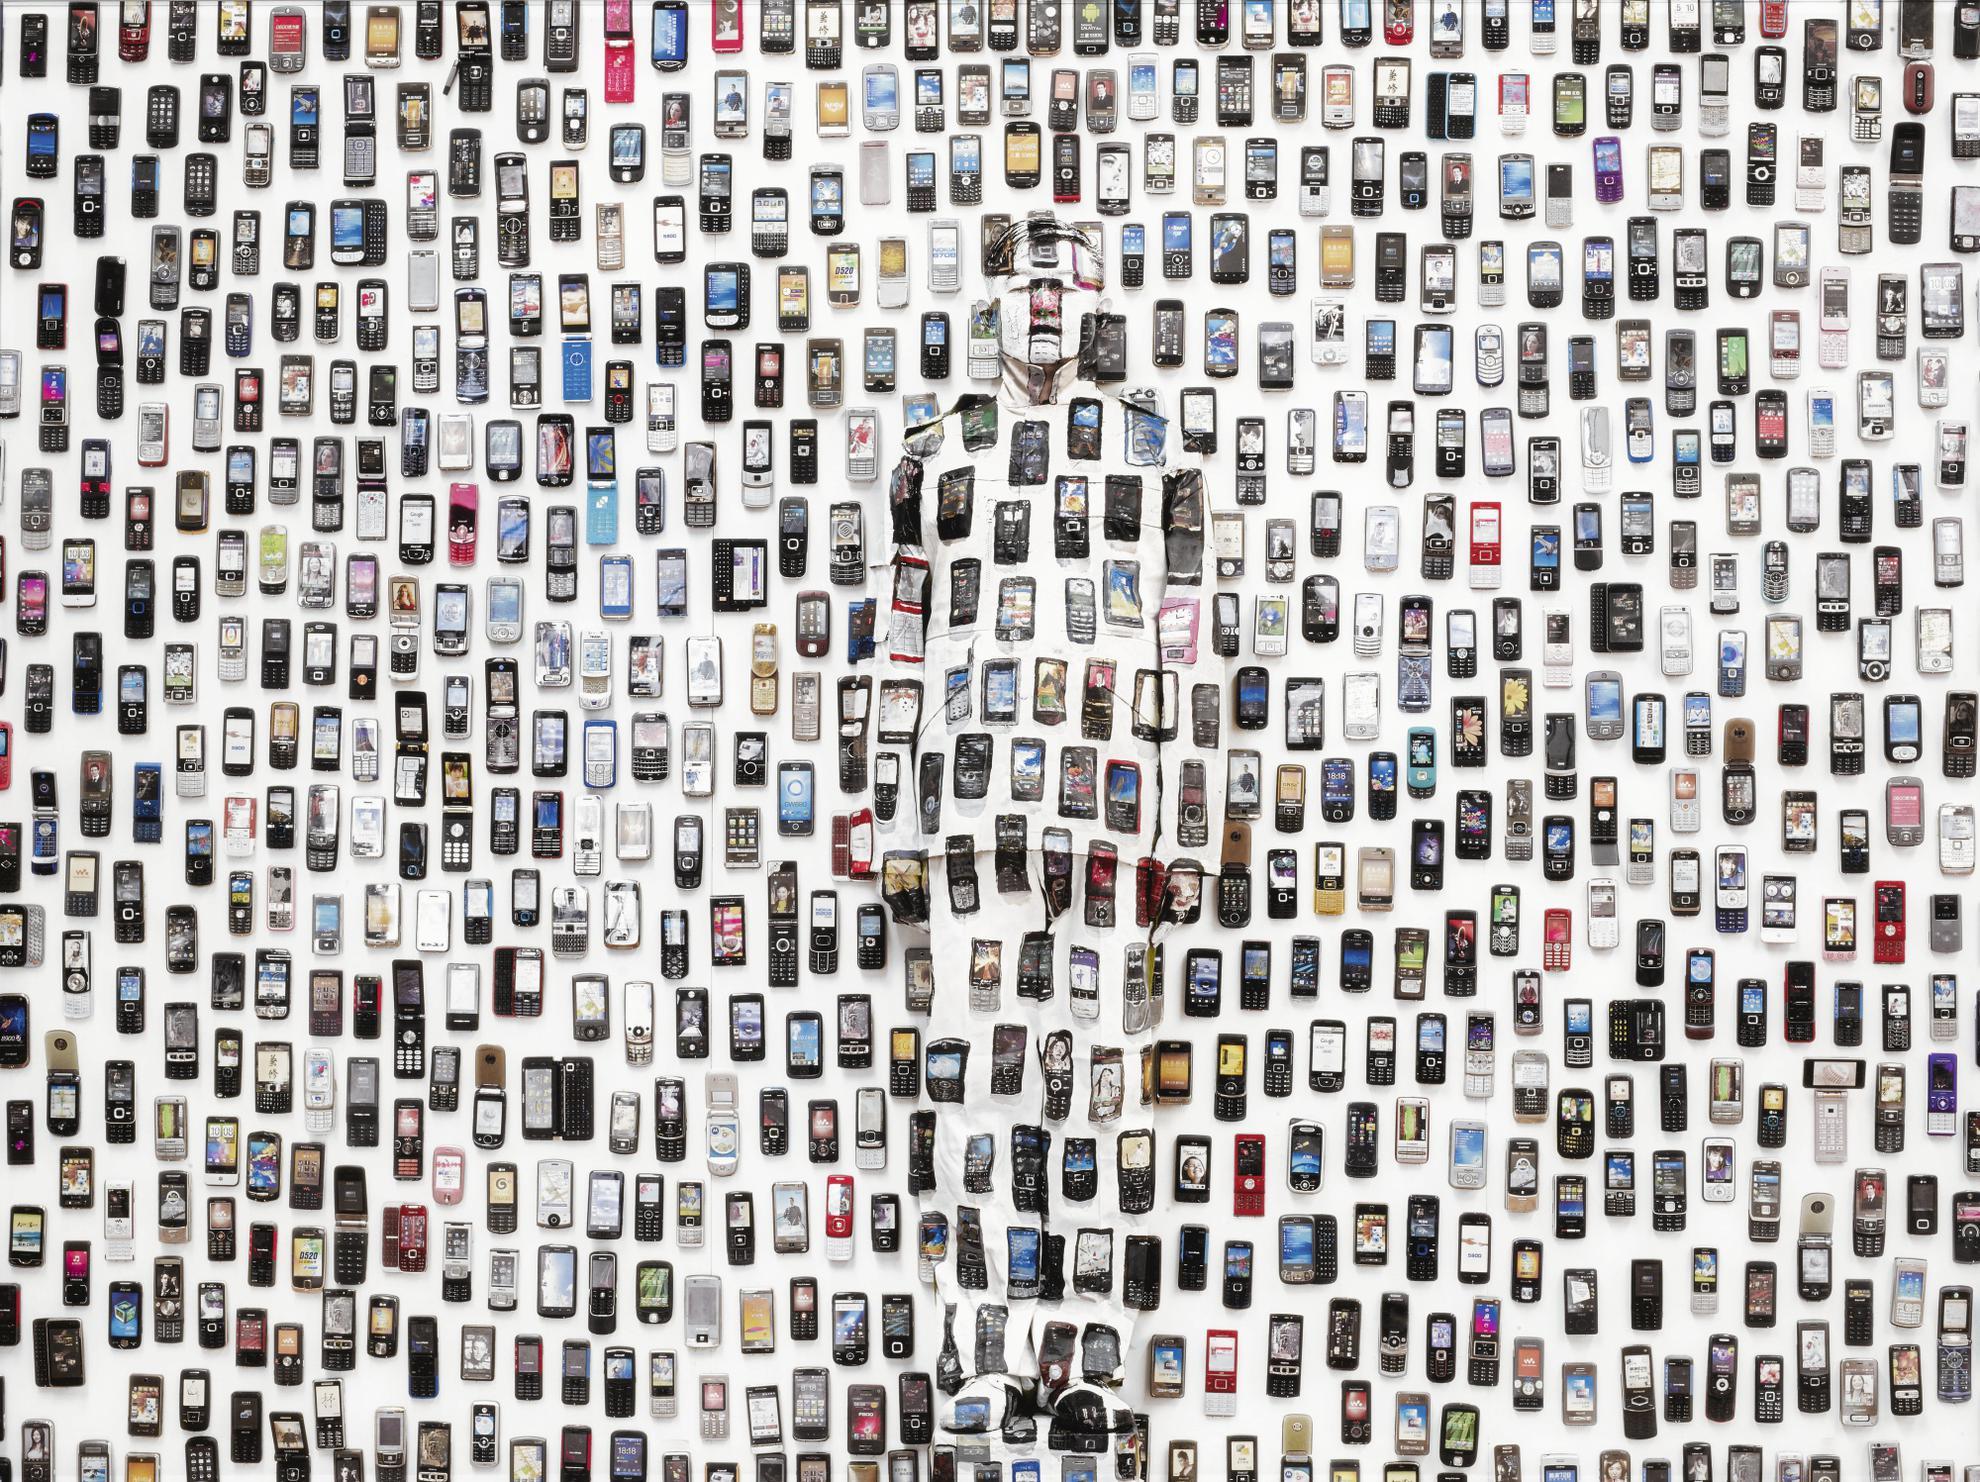 Liu Bolin-Hiding In The City: Mobile Phone-2012